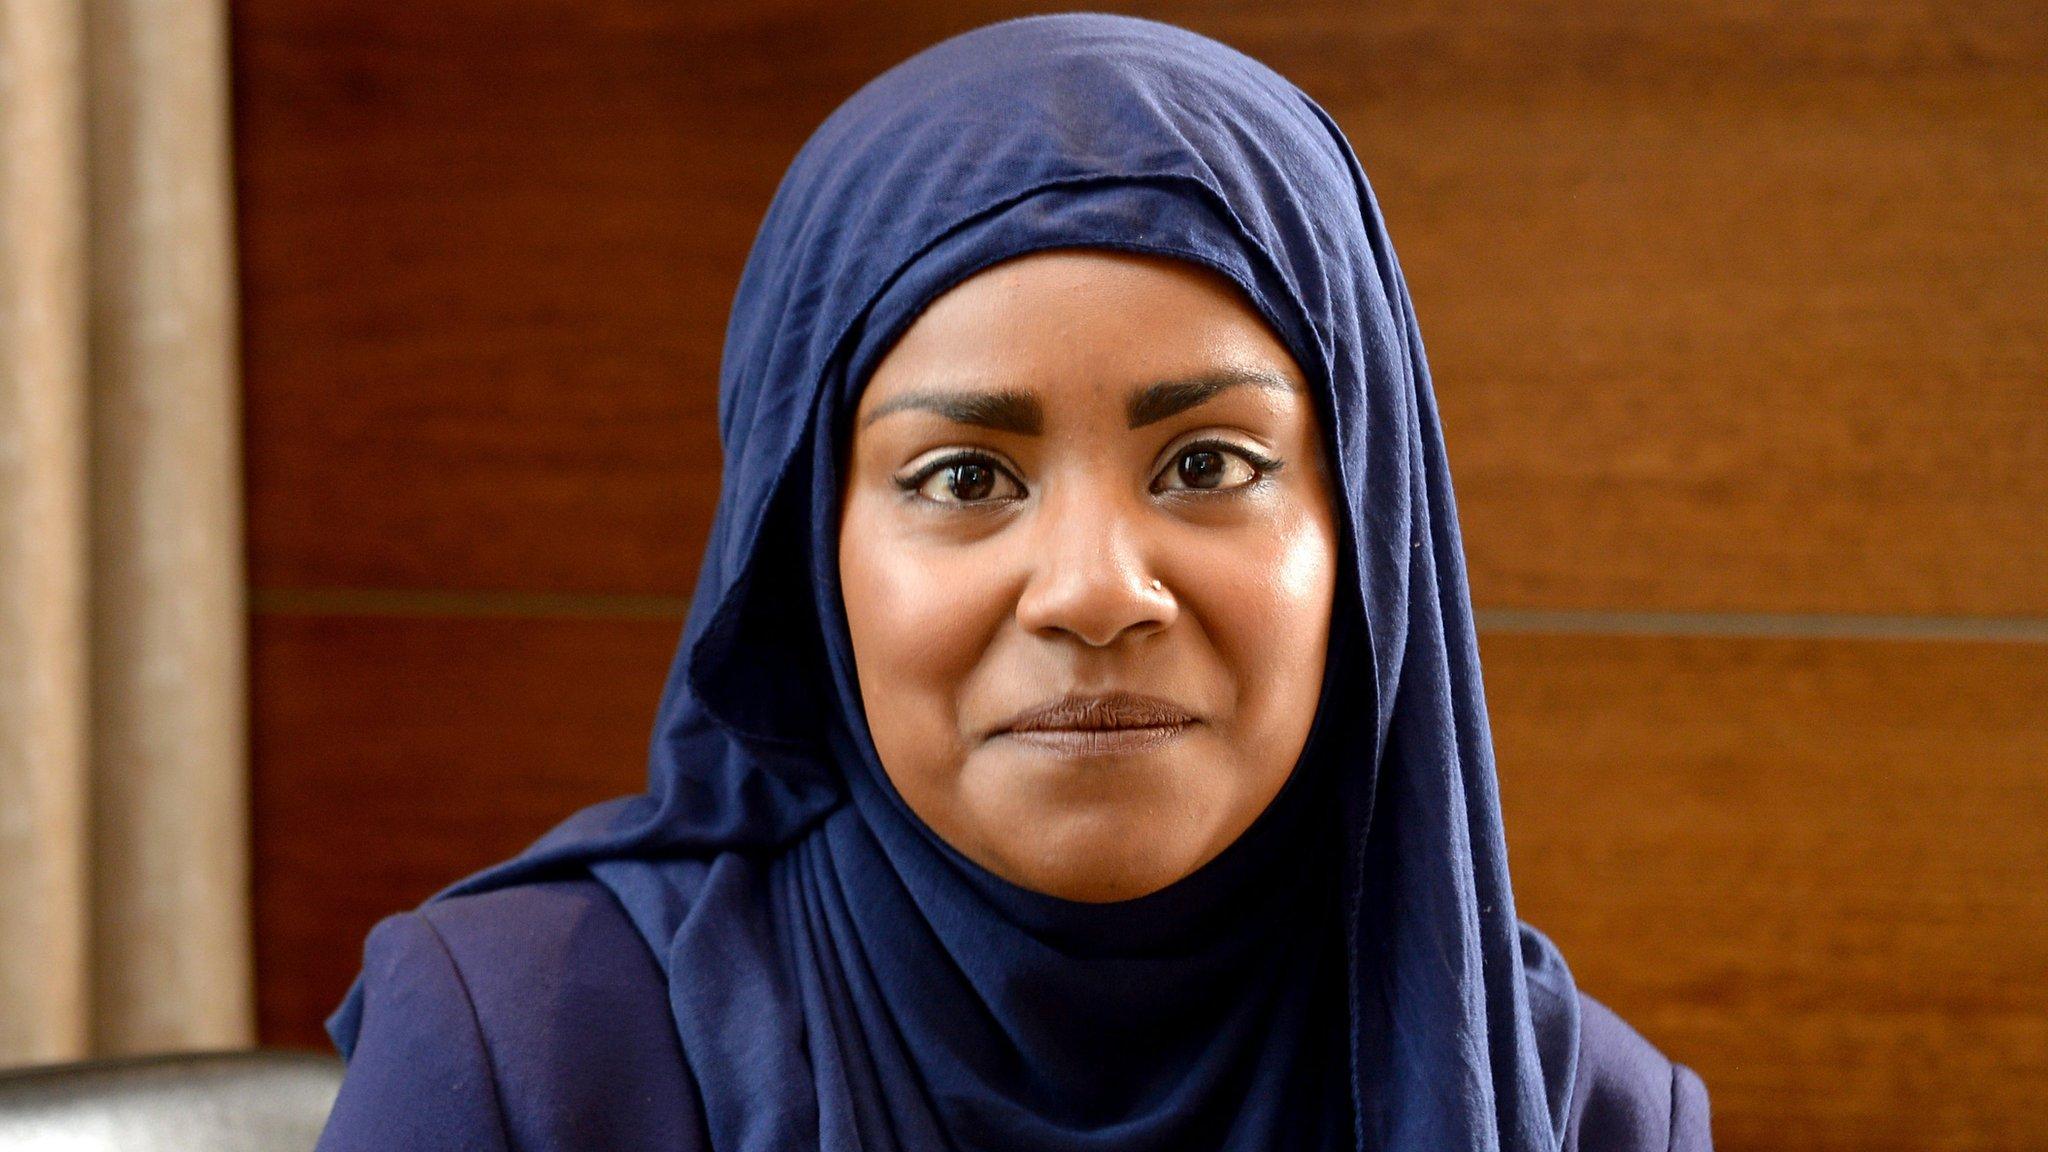 Great British Bake Off's Nadiya Hussain given food show